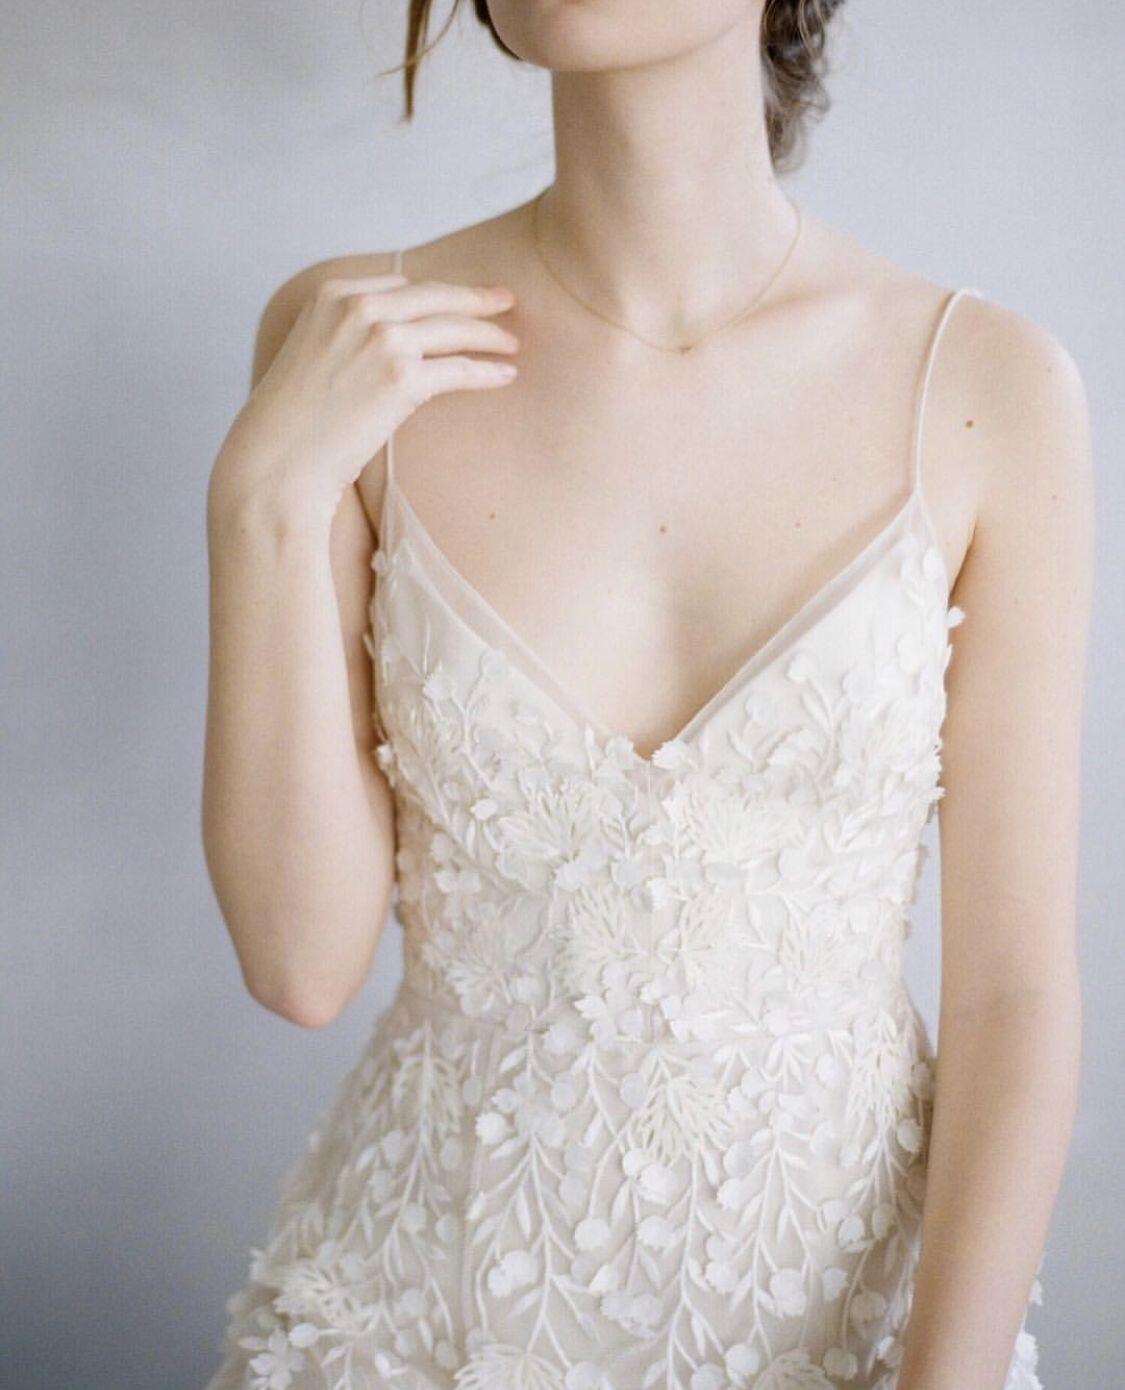 Vintage Wedding Dresses Omaha Ne: Wedding Dresses Image By Mary Calhoun On Wedding And